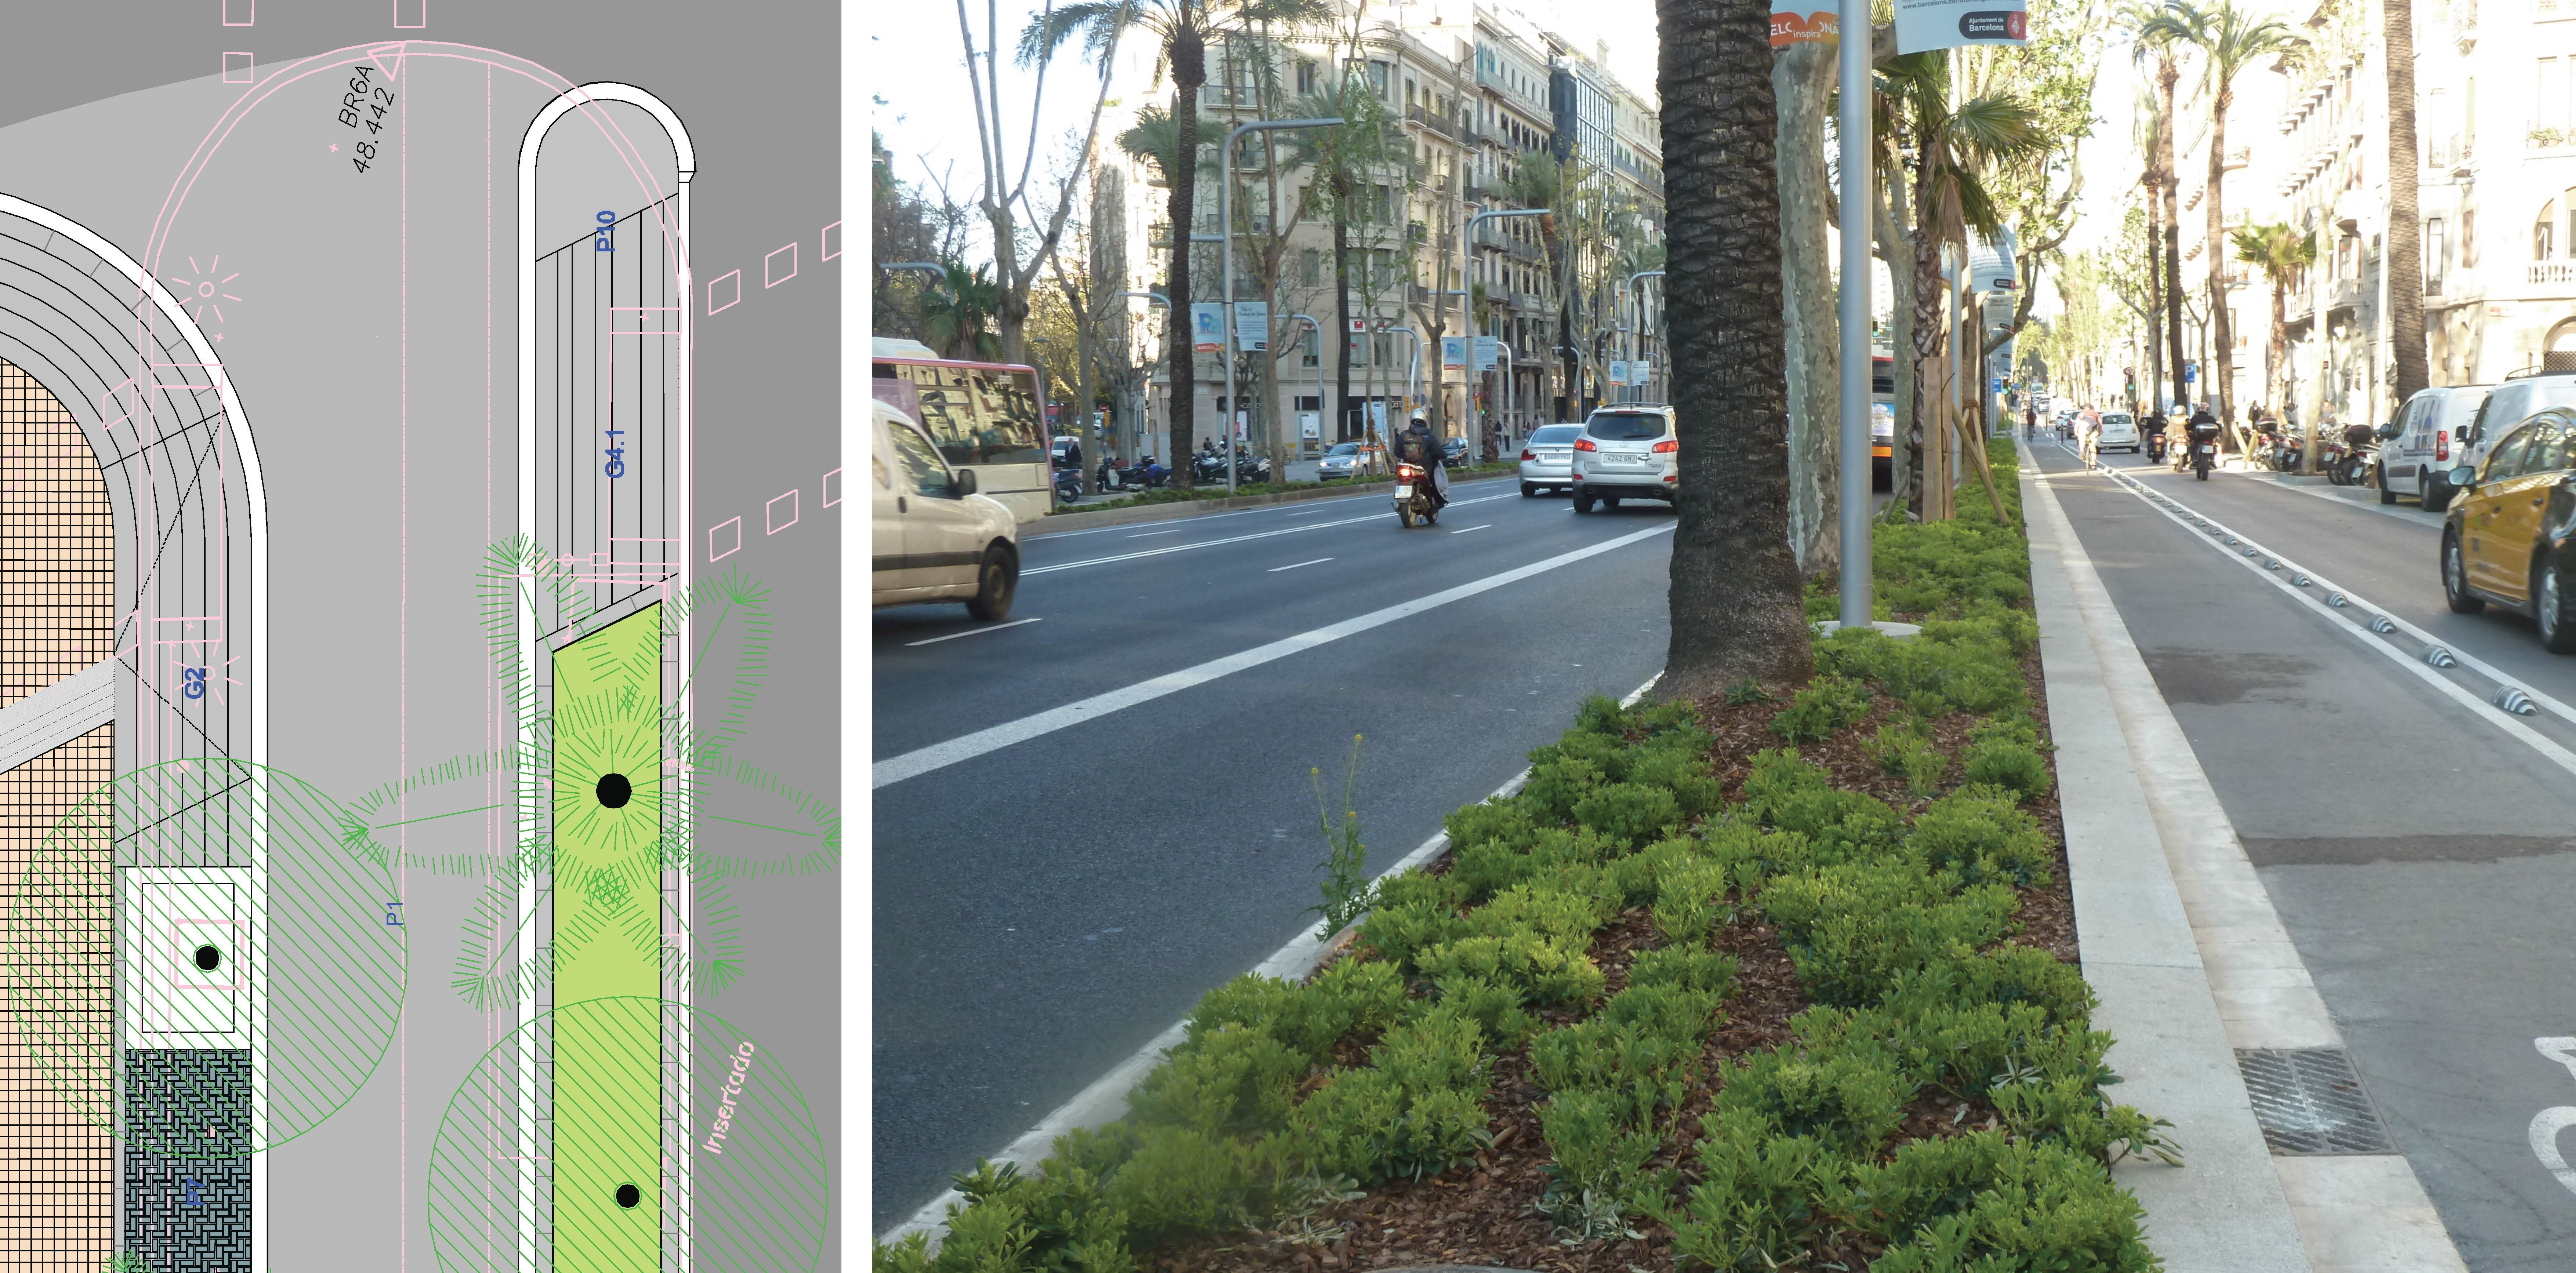 P. M. de la reforma de la Av. Diagonal de Barcelona: Trabajos de MasterPlan